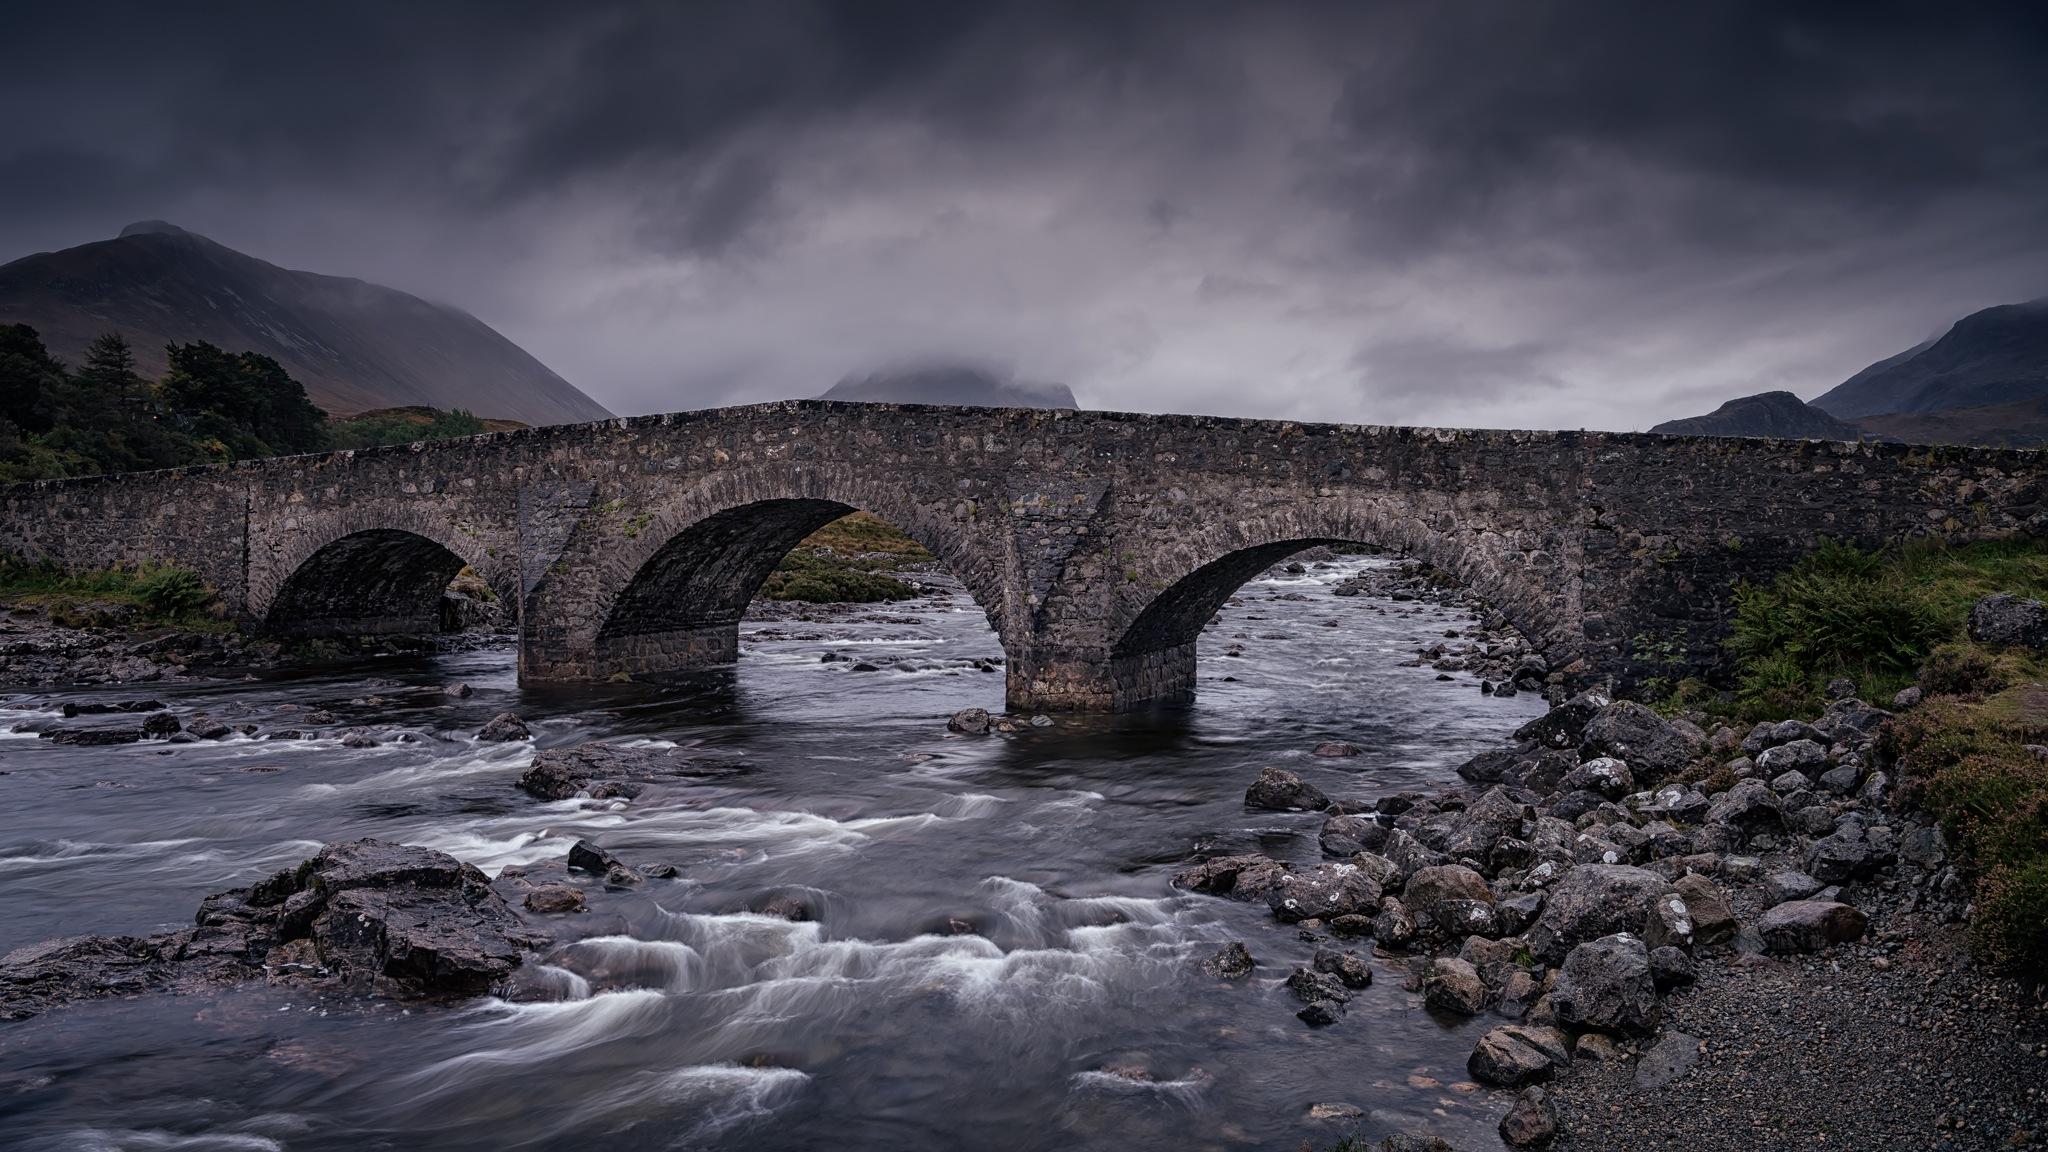 Old Bridge At Sligachan by Gabor Nagy